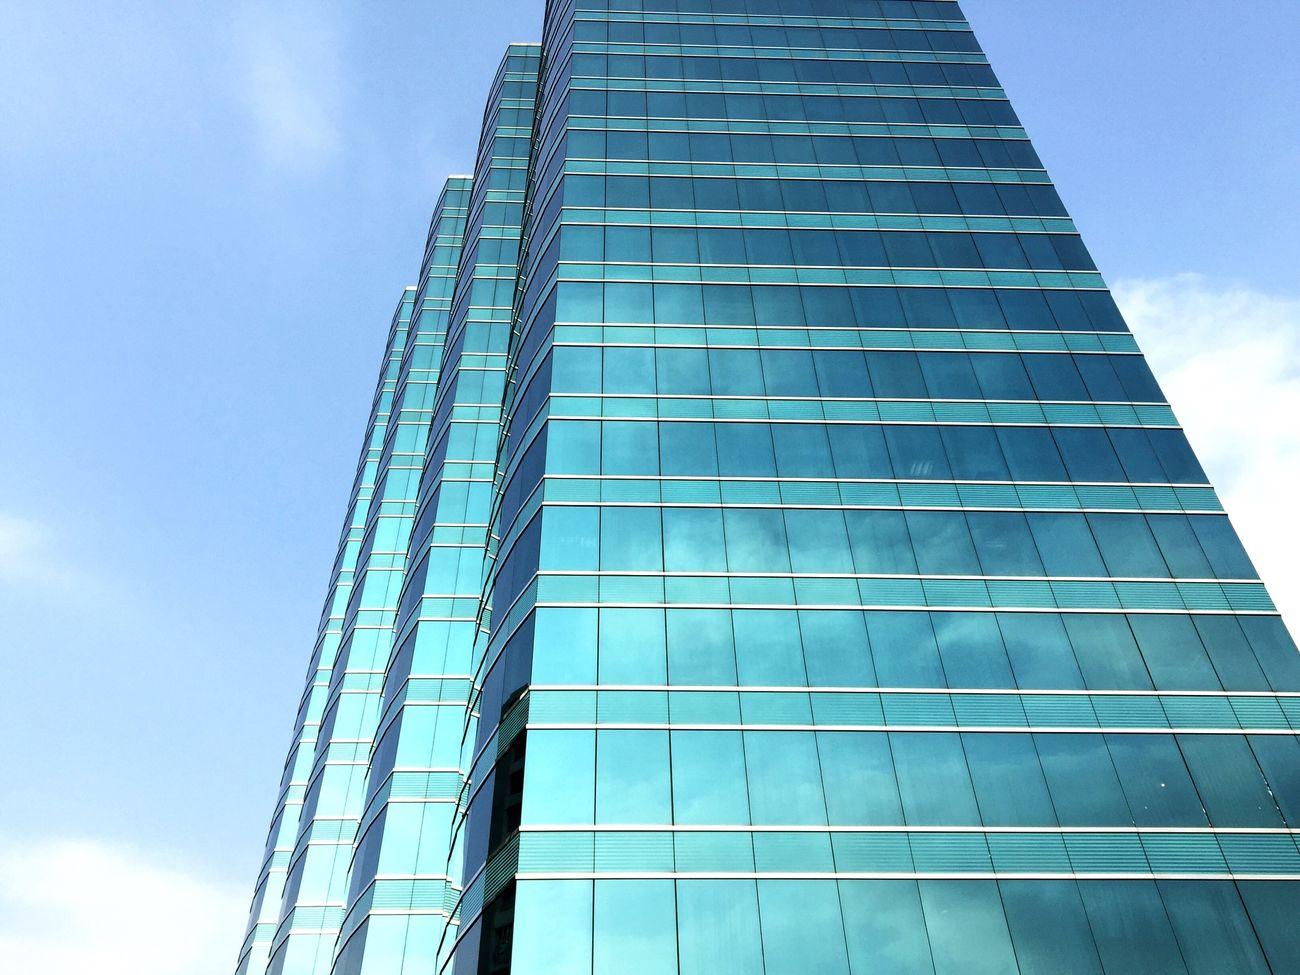 Hong Kong Blue Sky Blue House Skyscraper Blue Glass Reflection Clouds